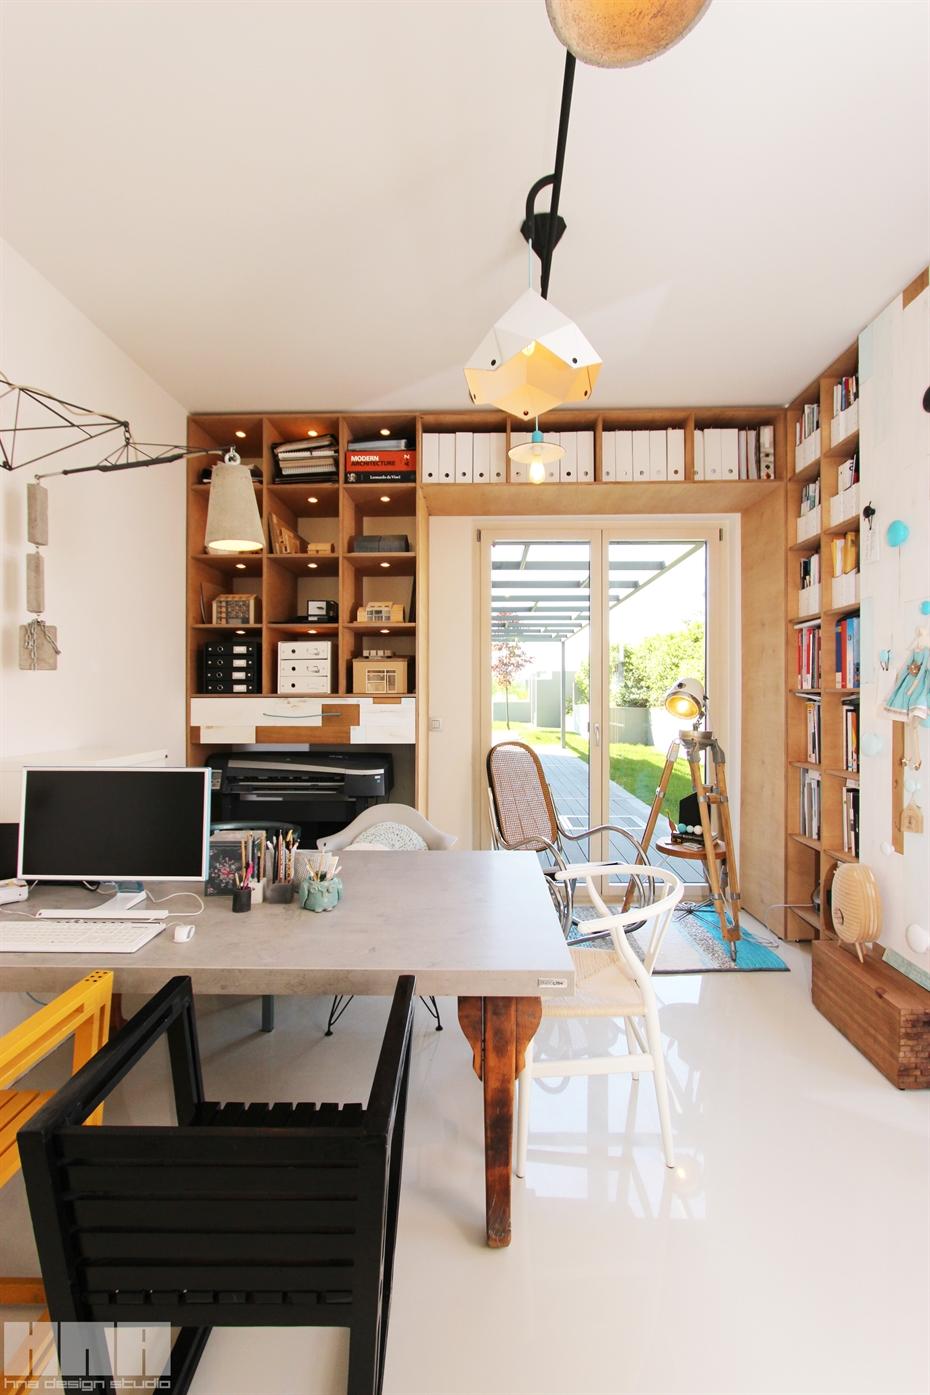 hna design studio iroda 18